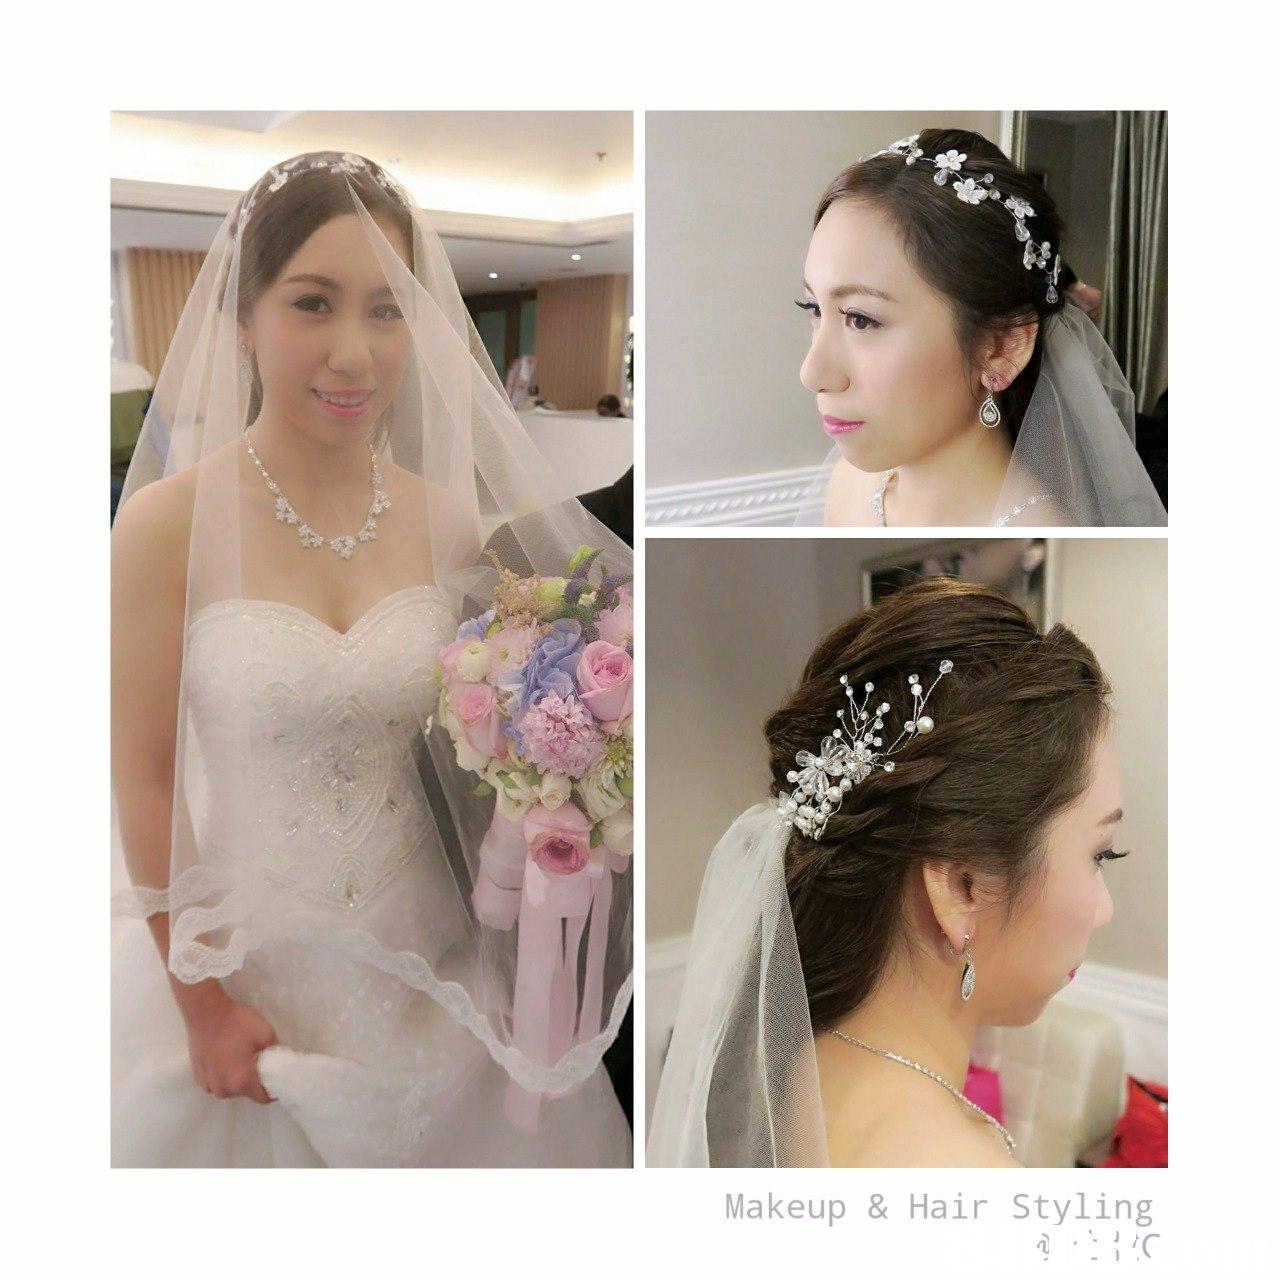 Makeup & Hair Styling,hair,bride,headpiece,hair accessory,jewellery